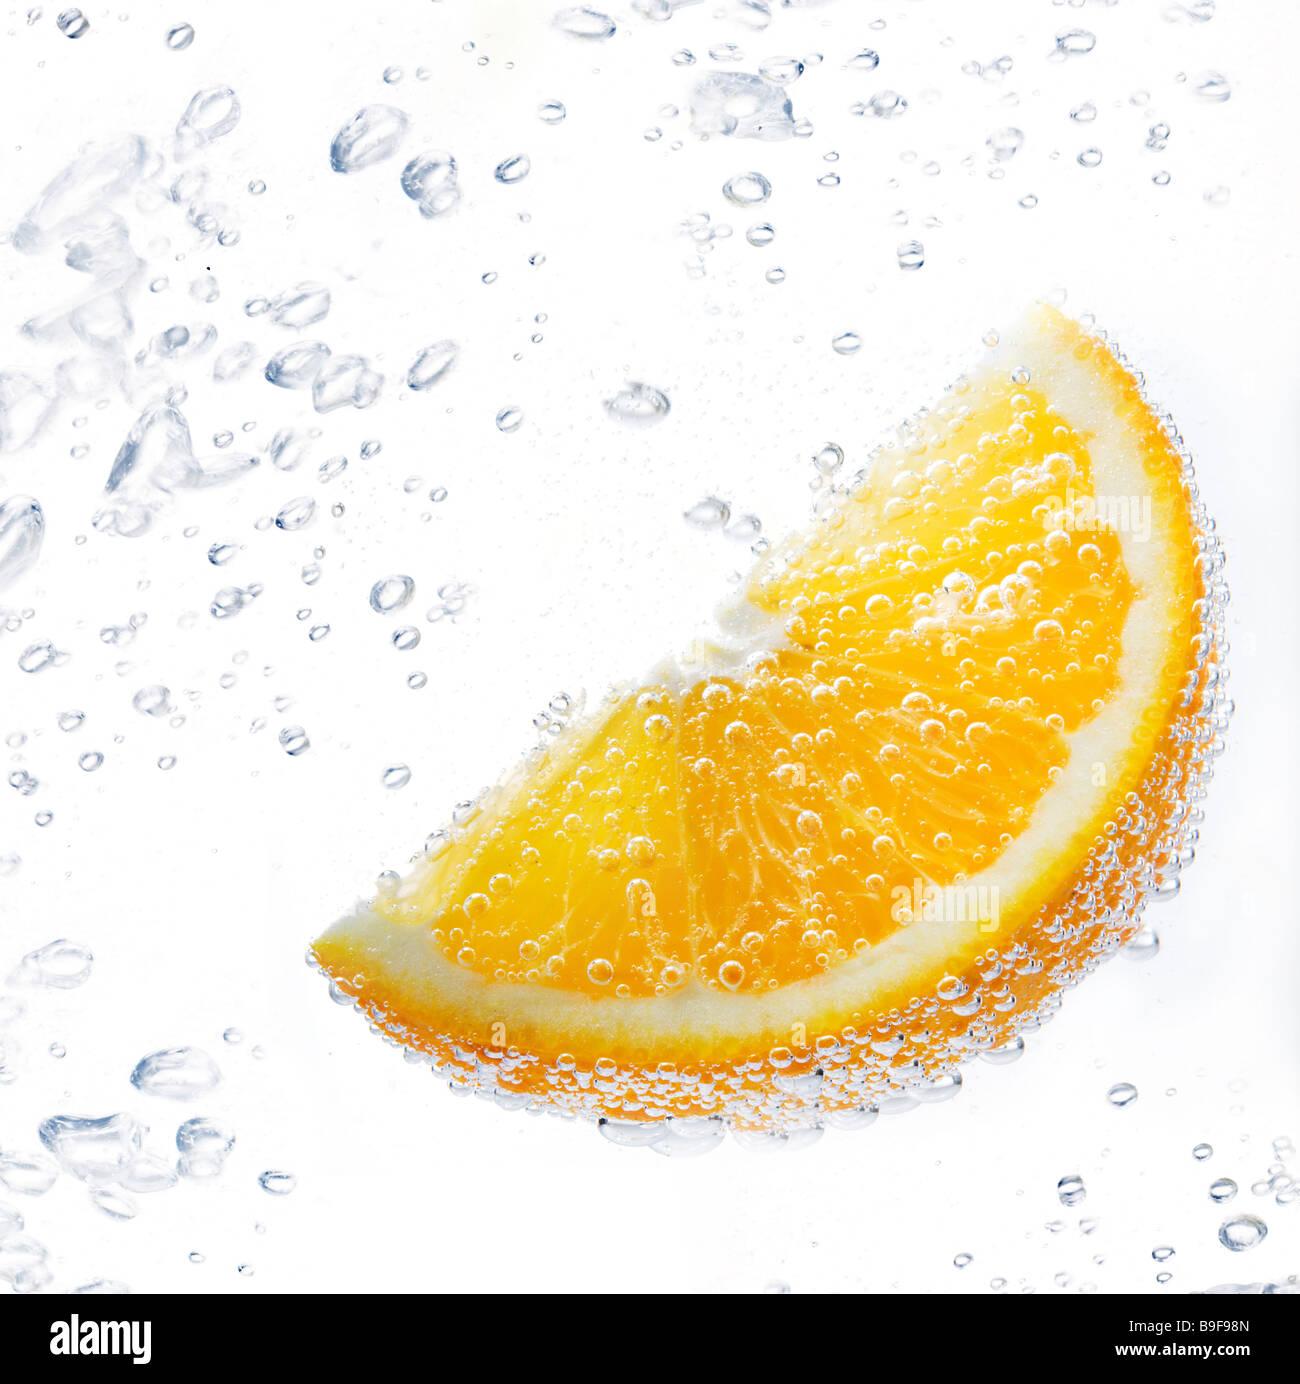 Piece of orange under water - Stock Image